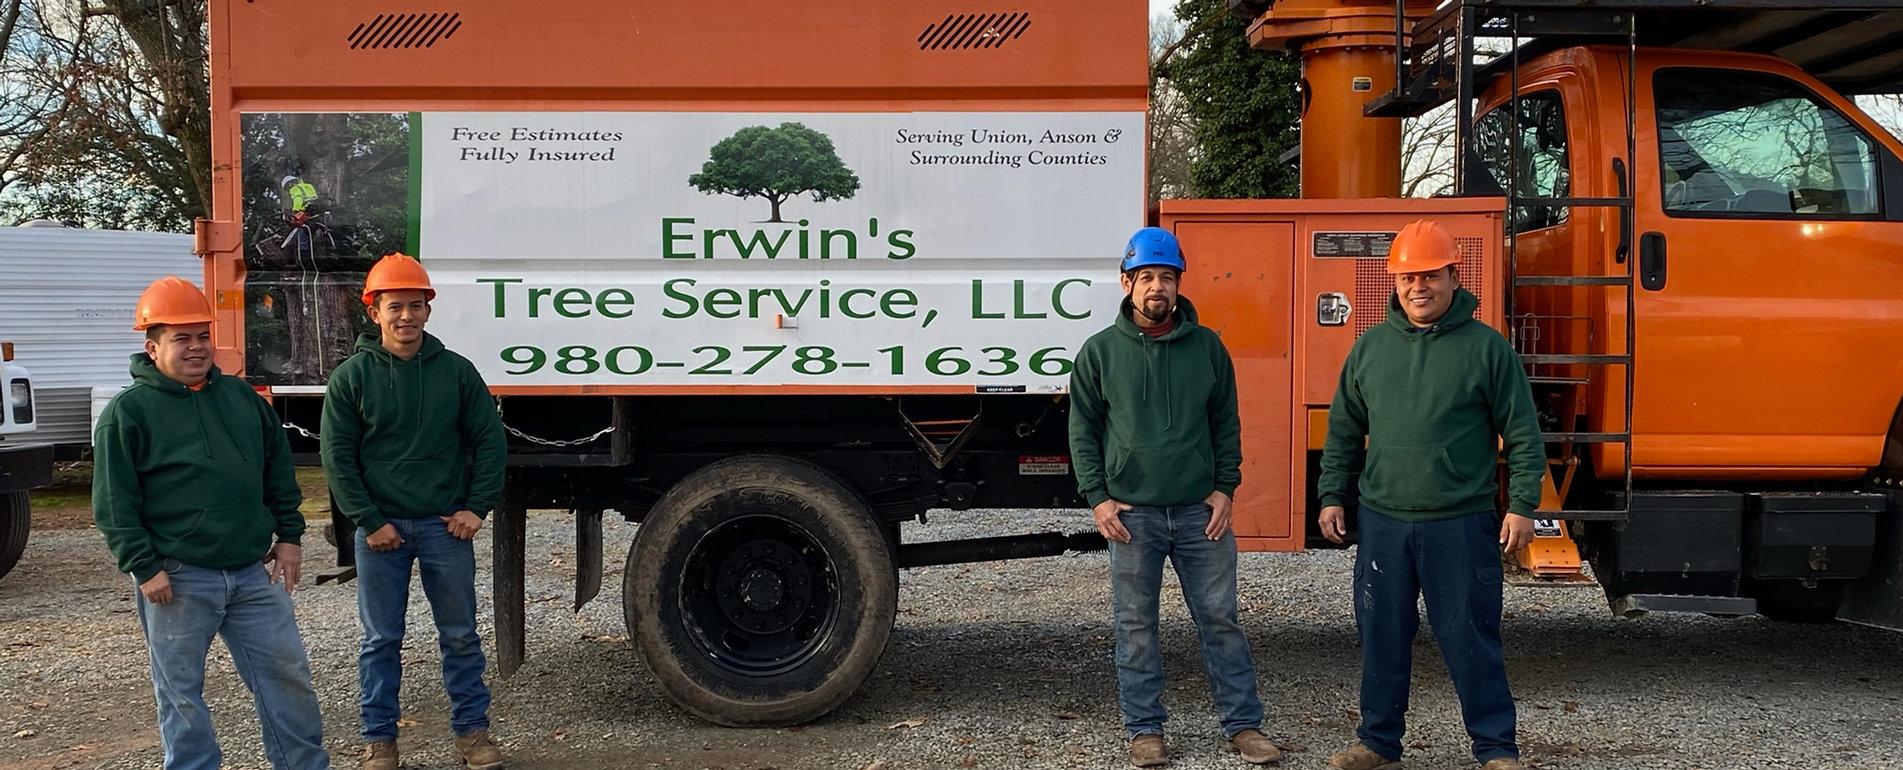 Erwins-work-crew-1482.jpg